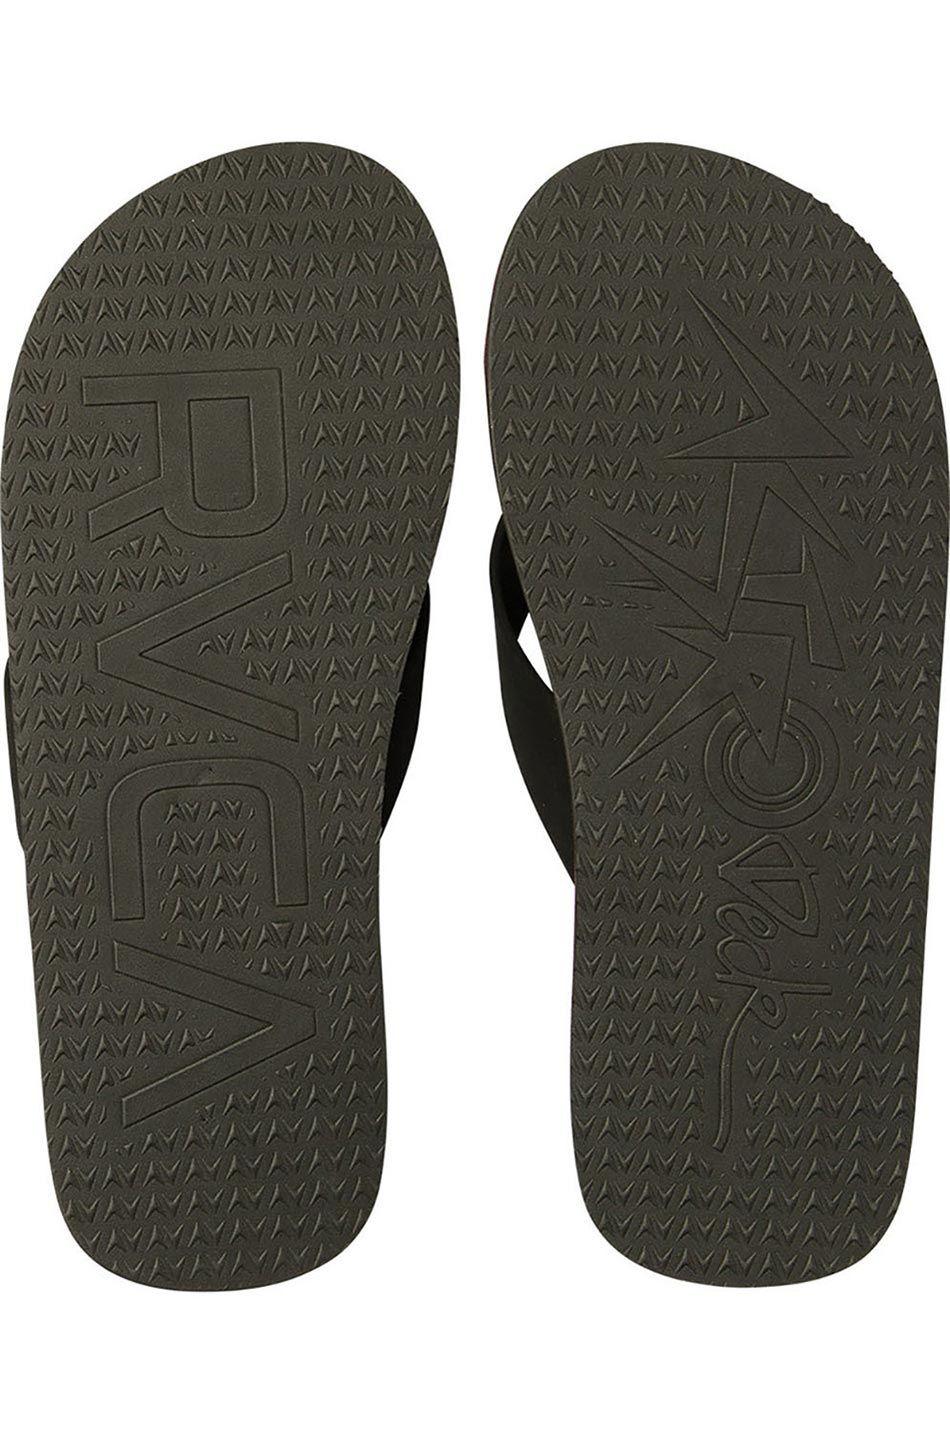 RVCA Sandals ASTRODECK Black